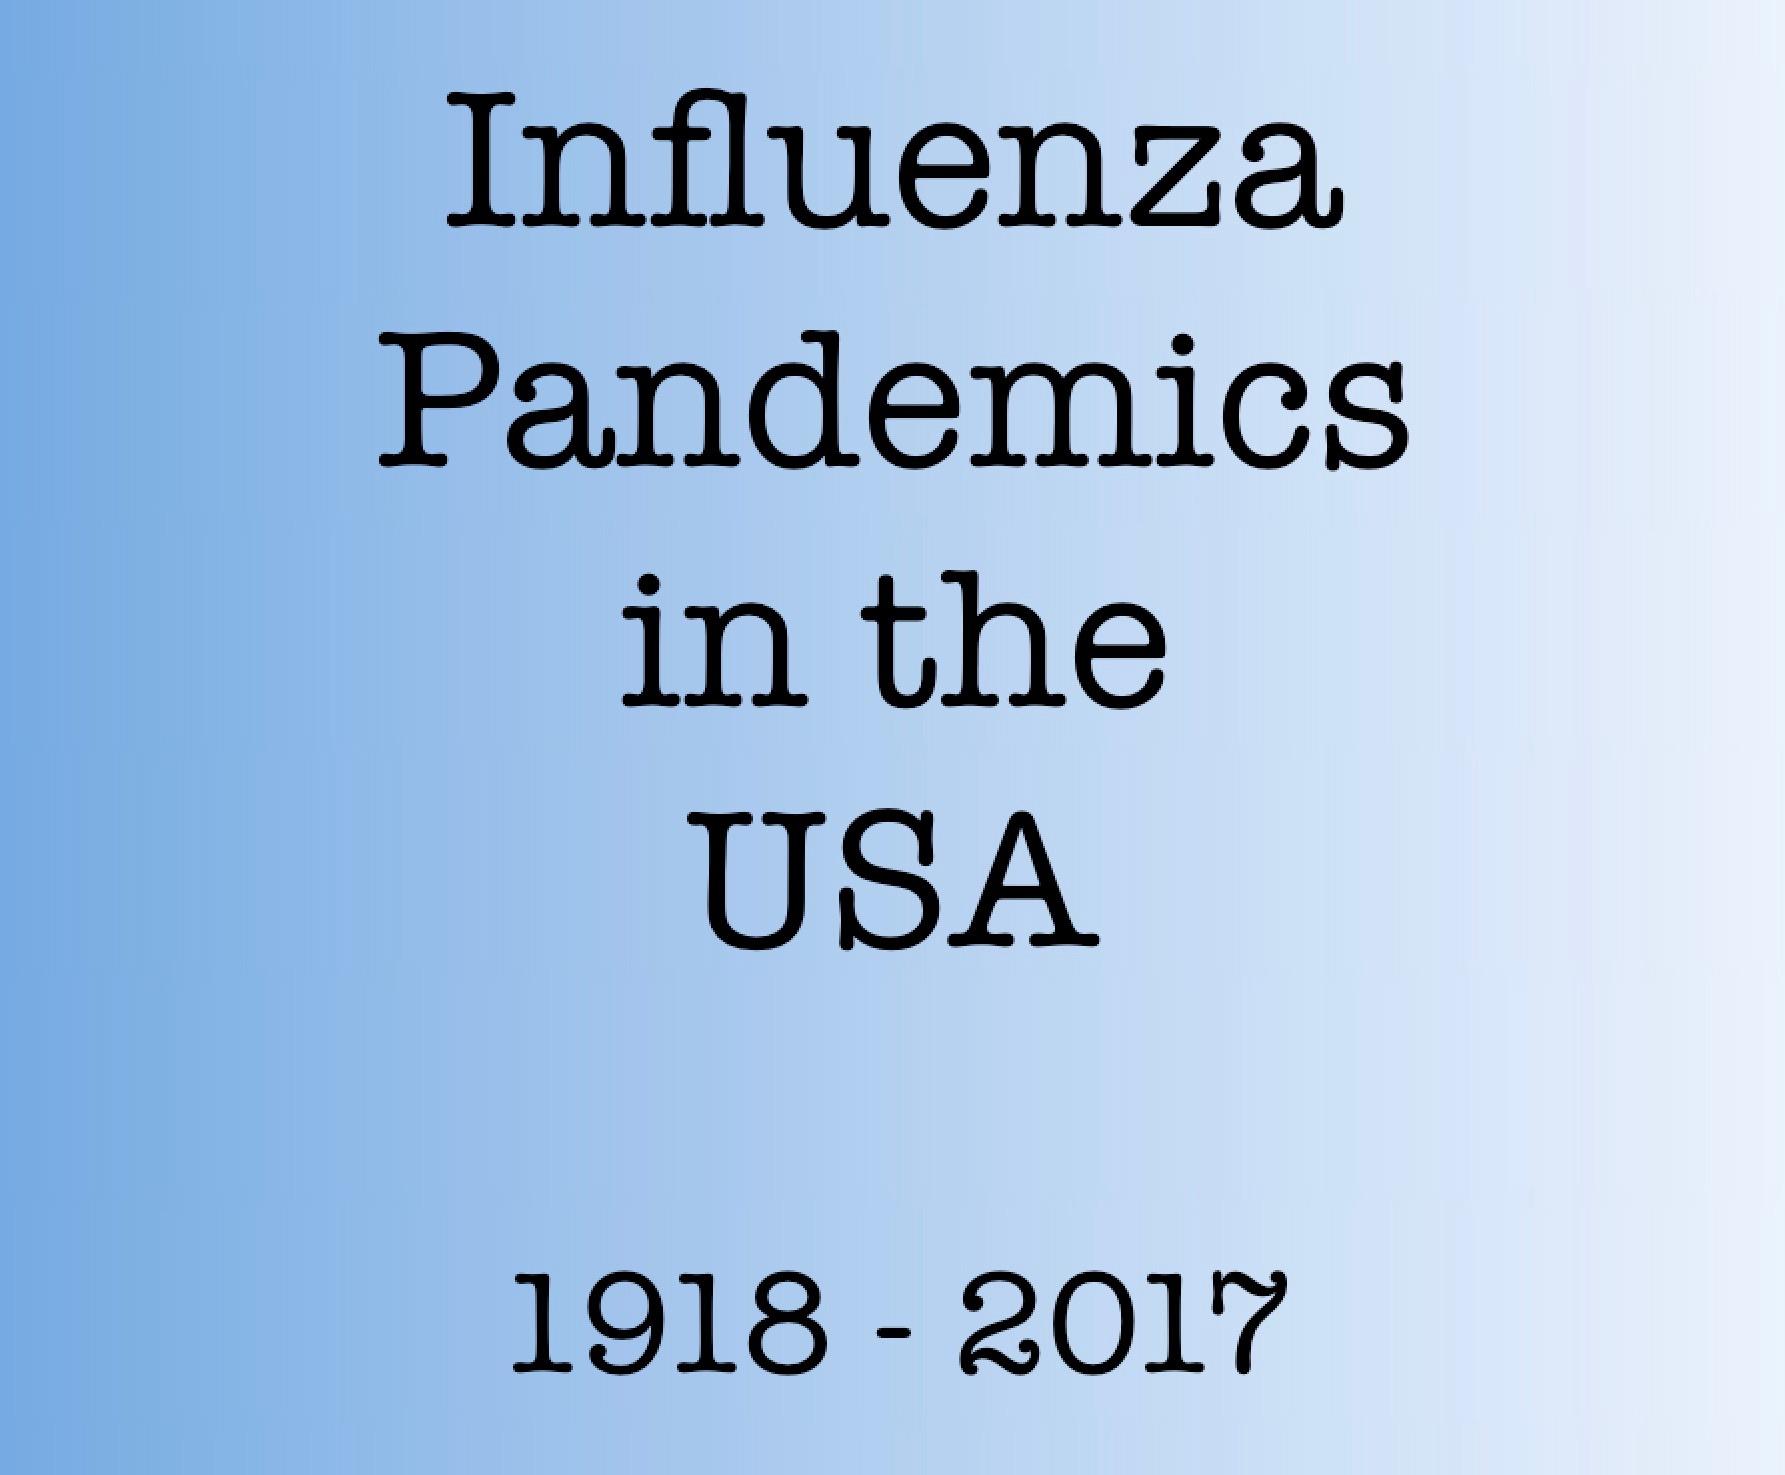 Influenza Pandemics